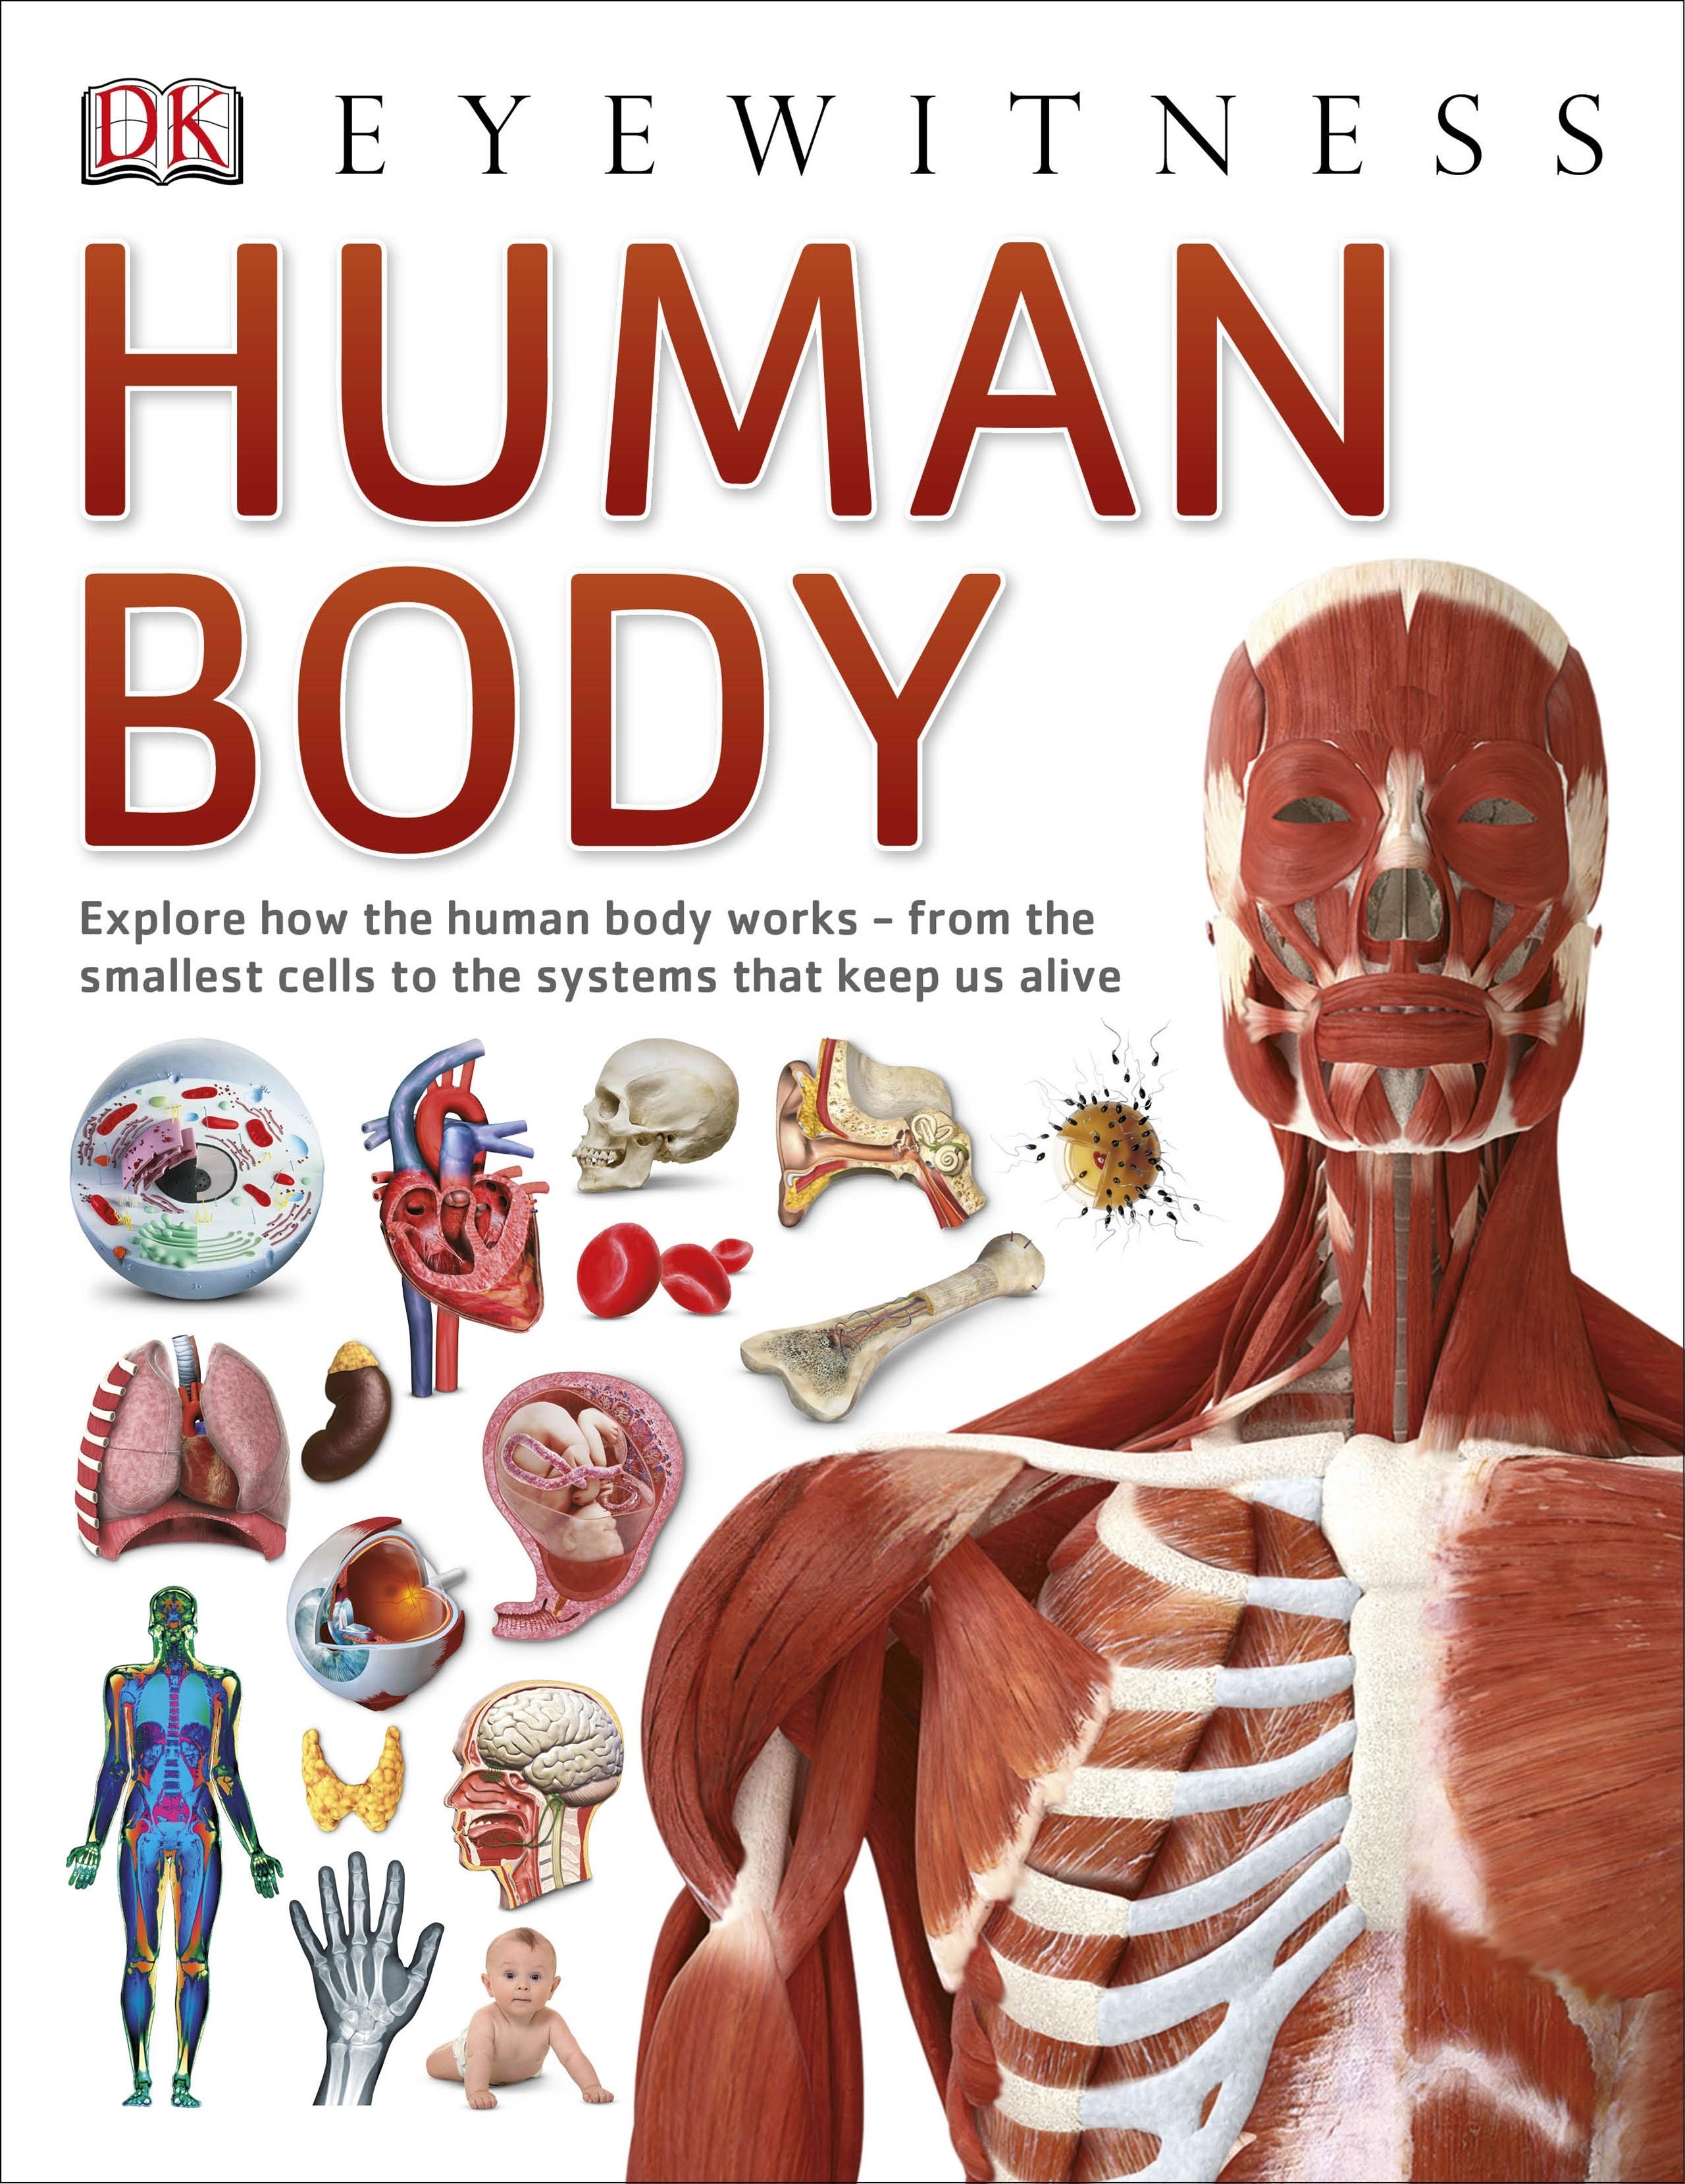 Dk Eyewitness Human Body By Dk Penguin Books New Zealand